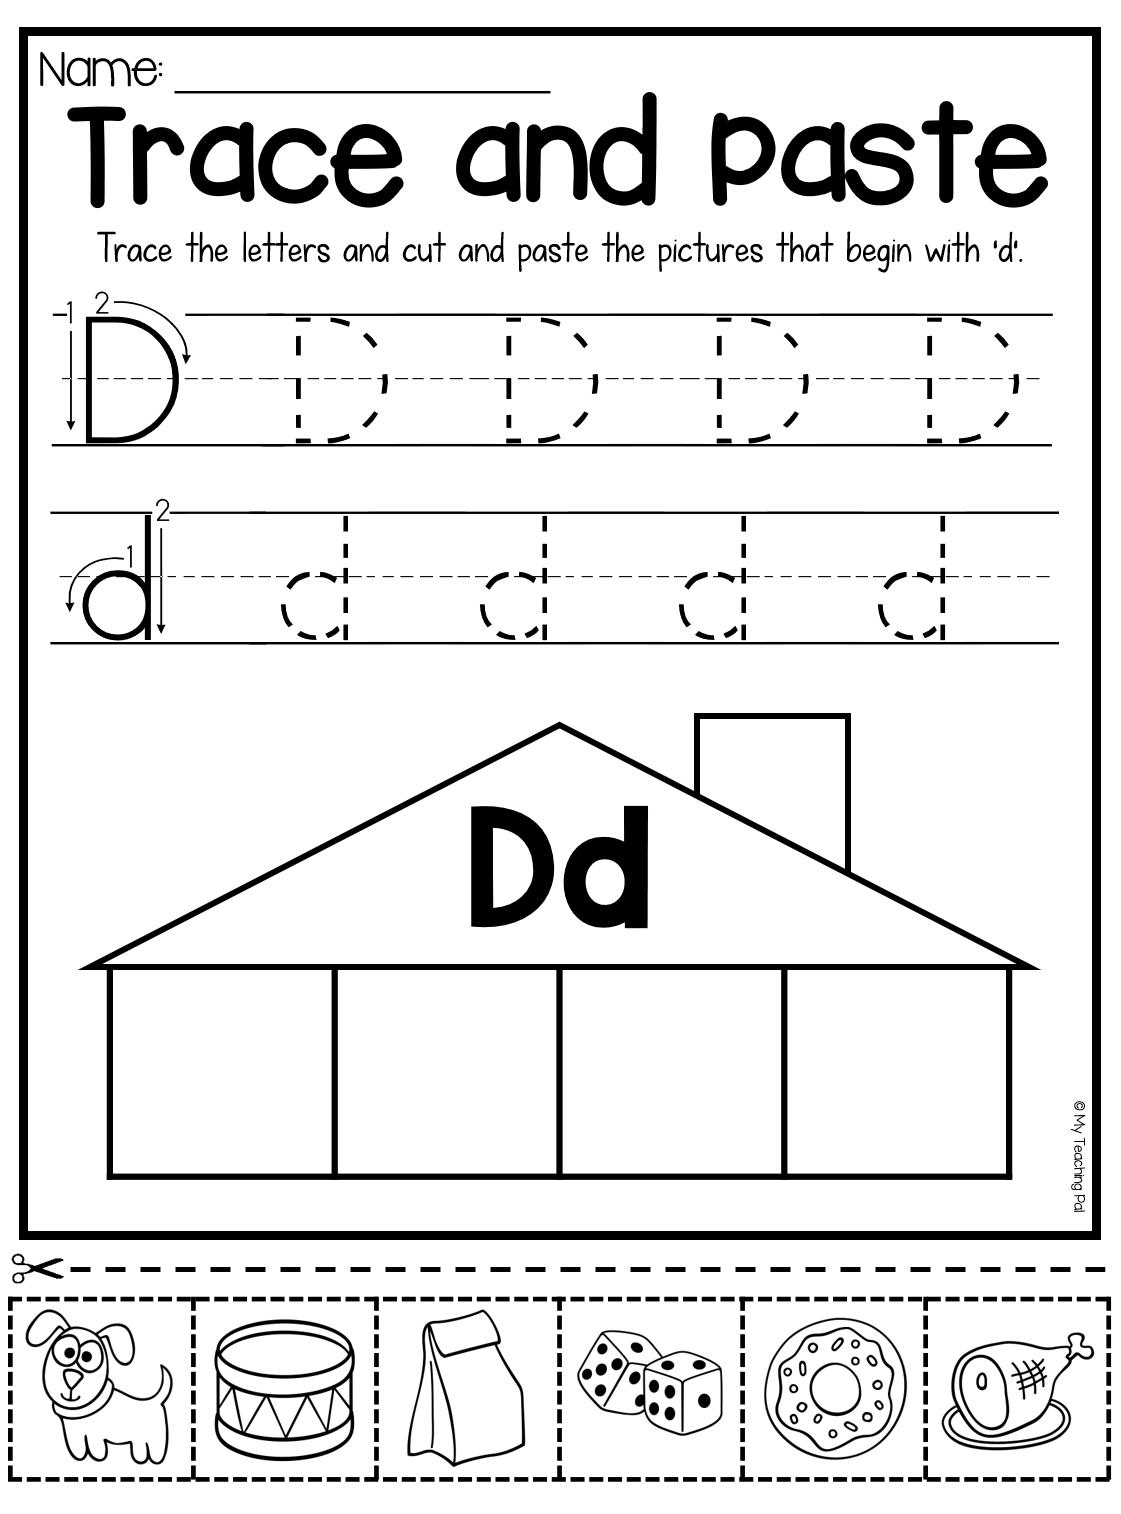 Beginning Sounds Worksheets - Trace and Paste   Letter d worksheet [ 1514 x 1121 Pixel ]